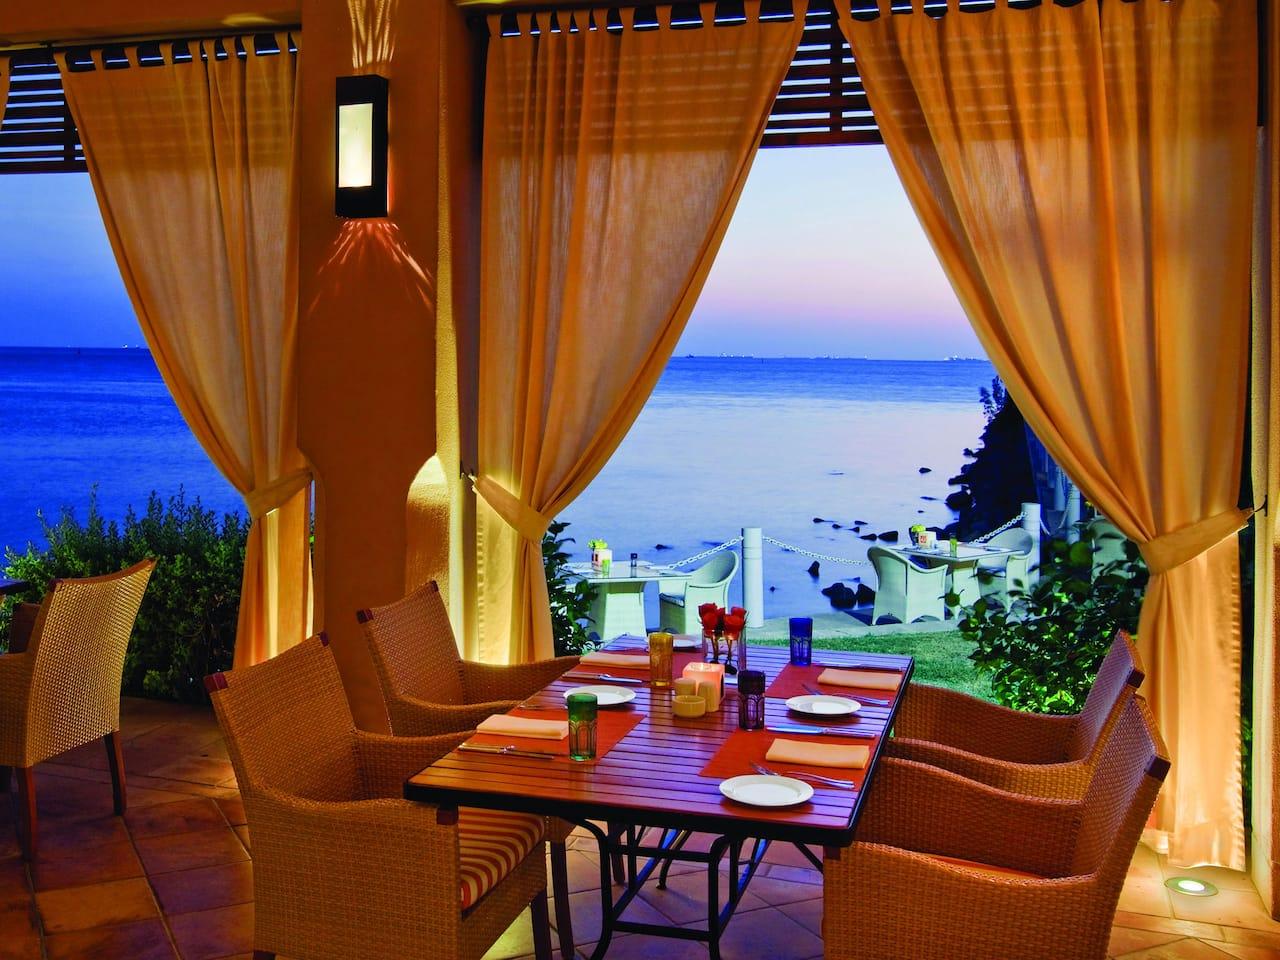 Andalusia Terrace